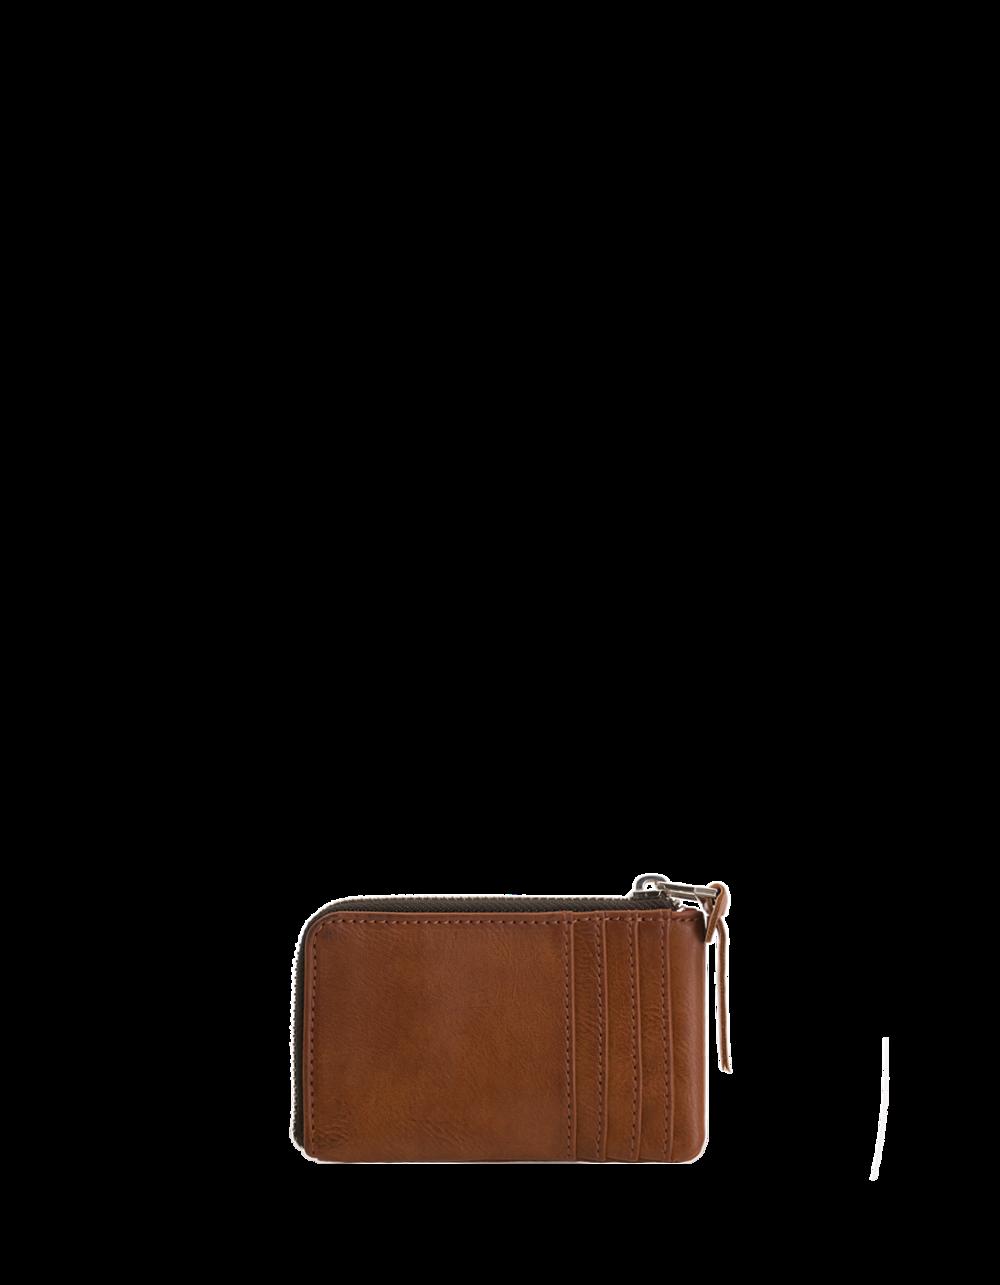 StradivariusMan_accessories (1).png